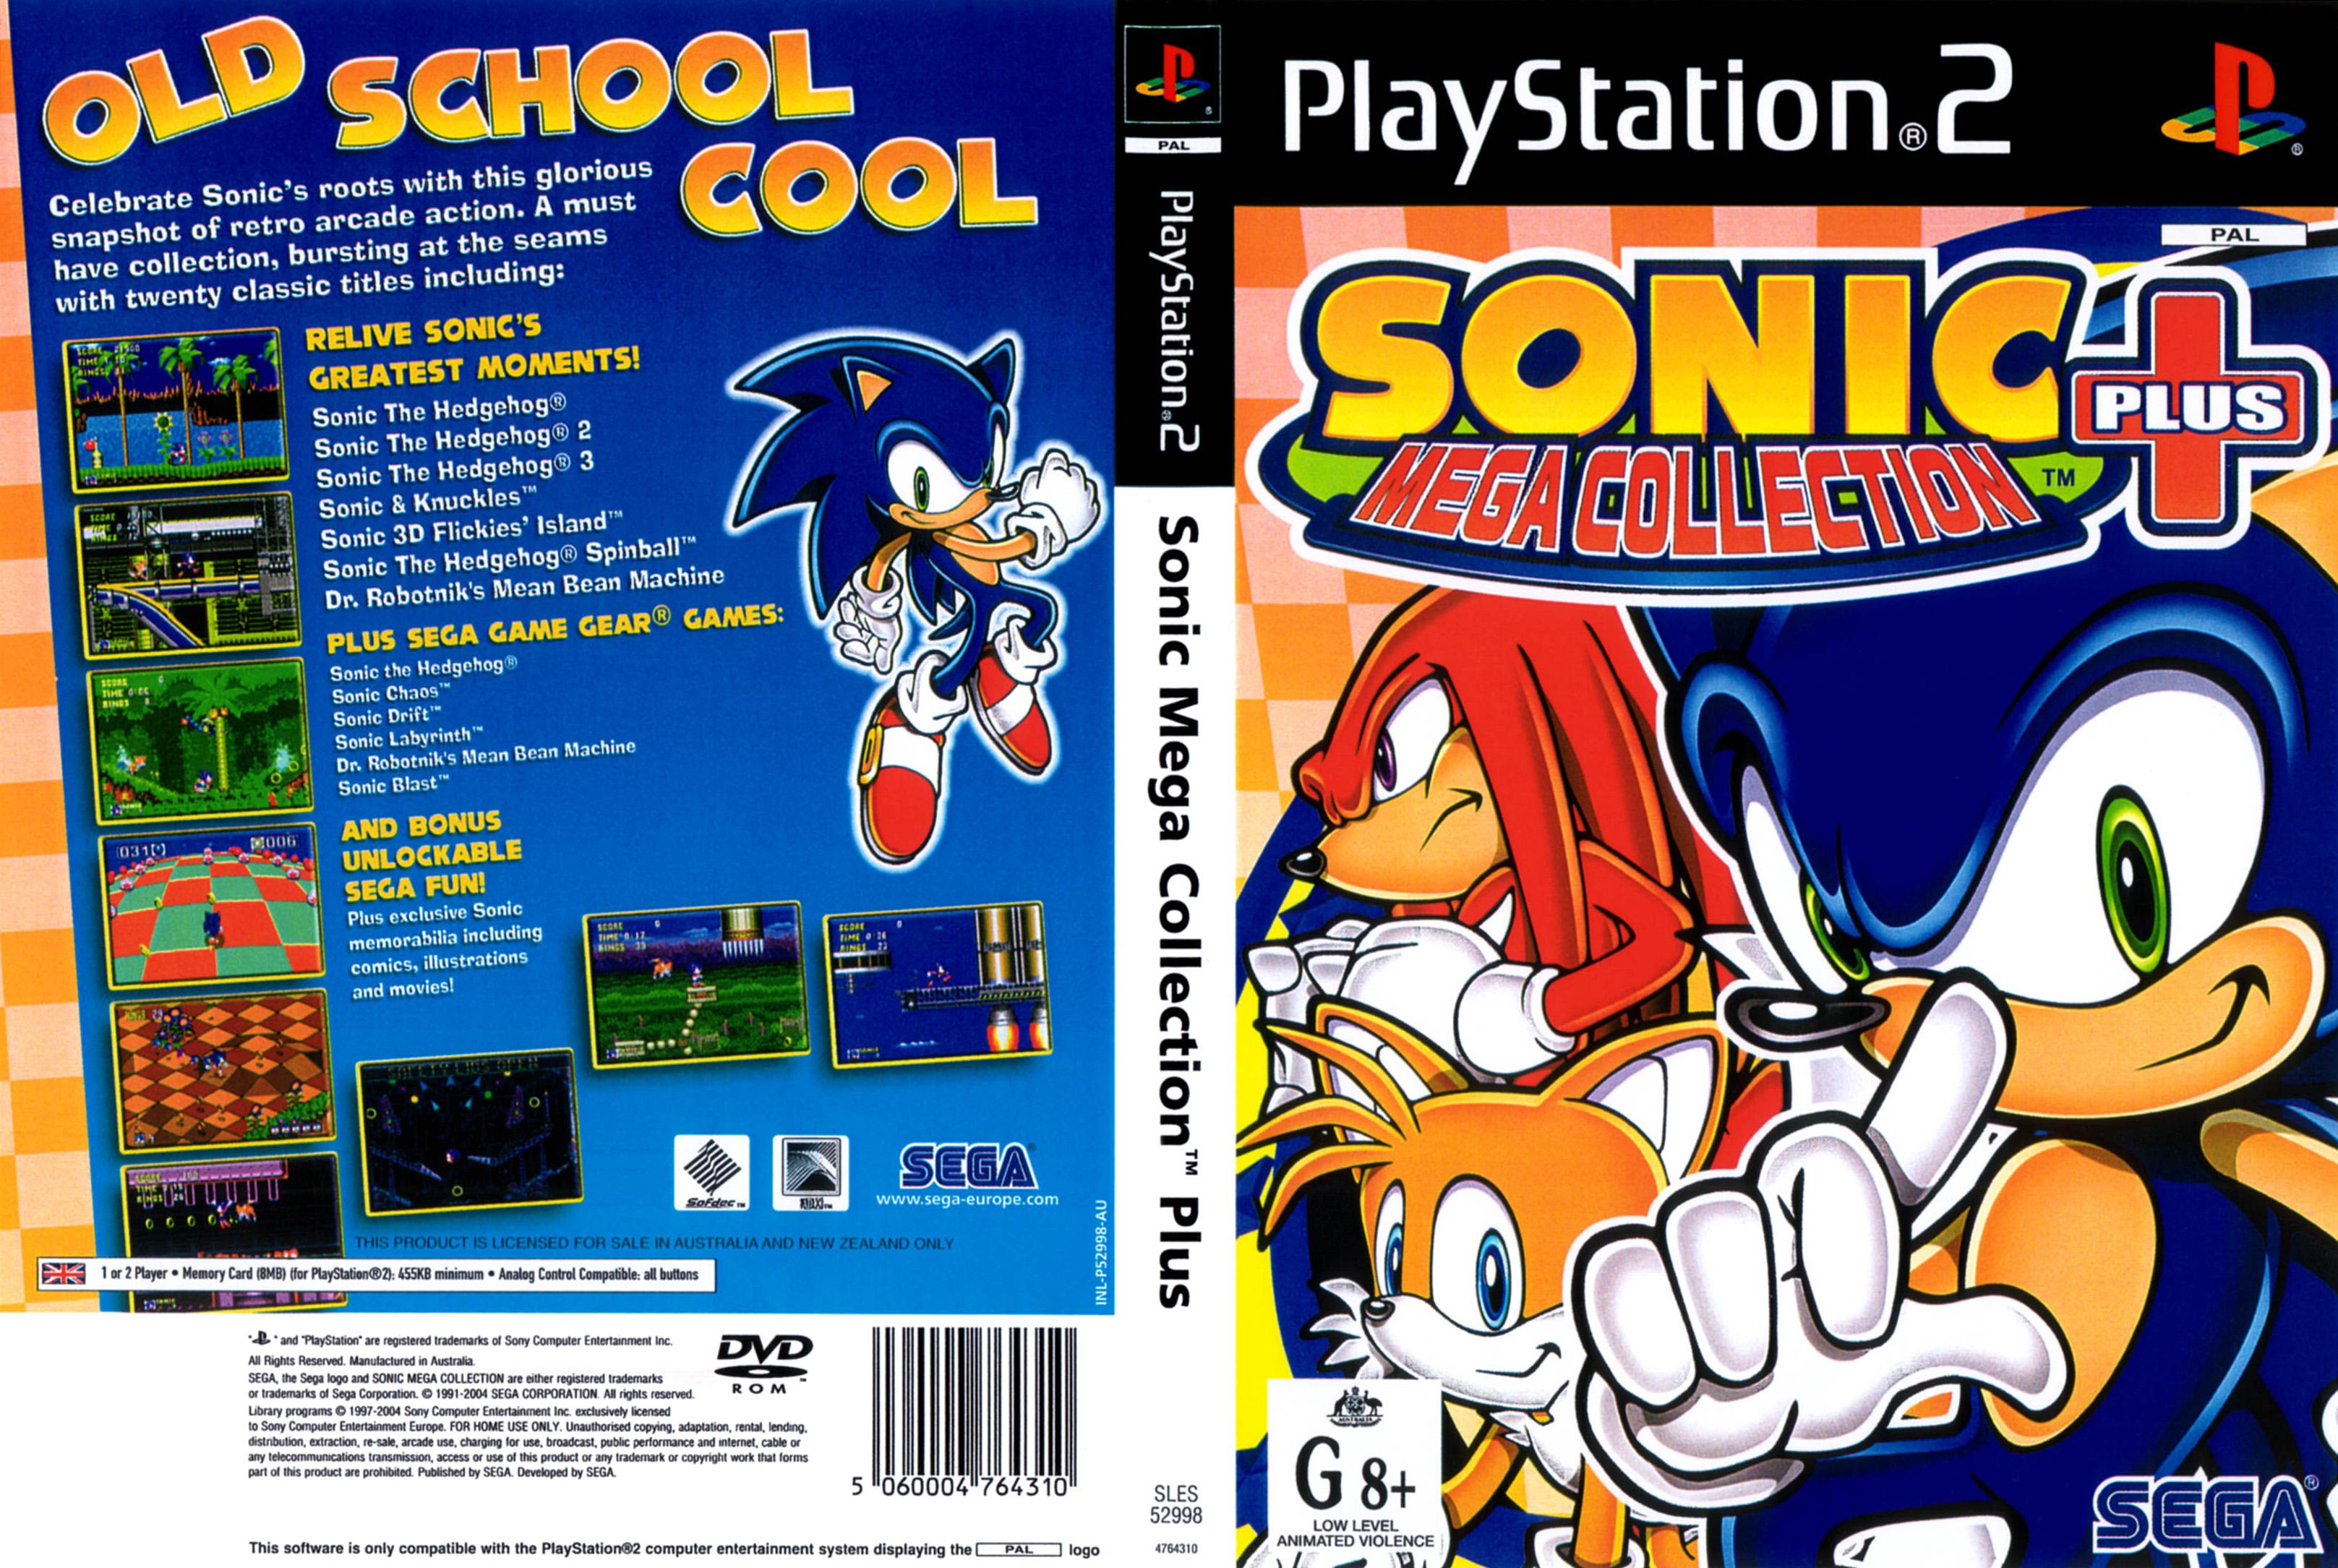 ANÁLISE: SONIC MEGA COLLECTION PLUS (PS2)